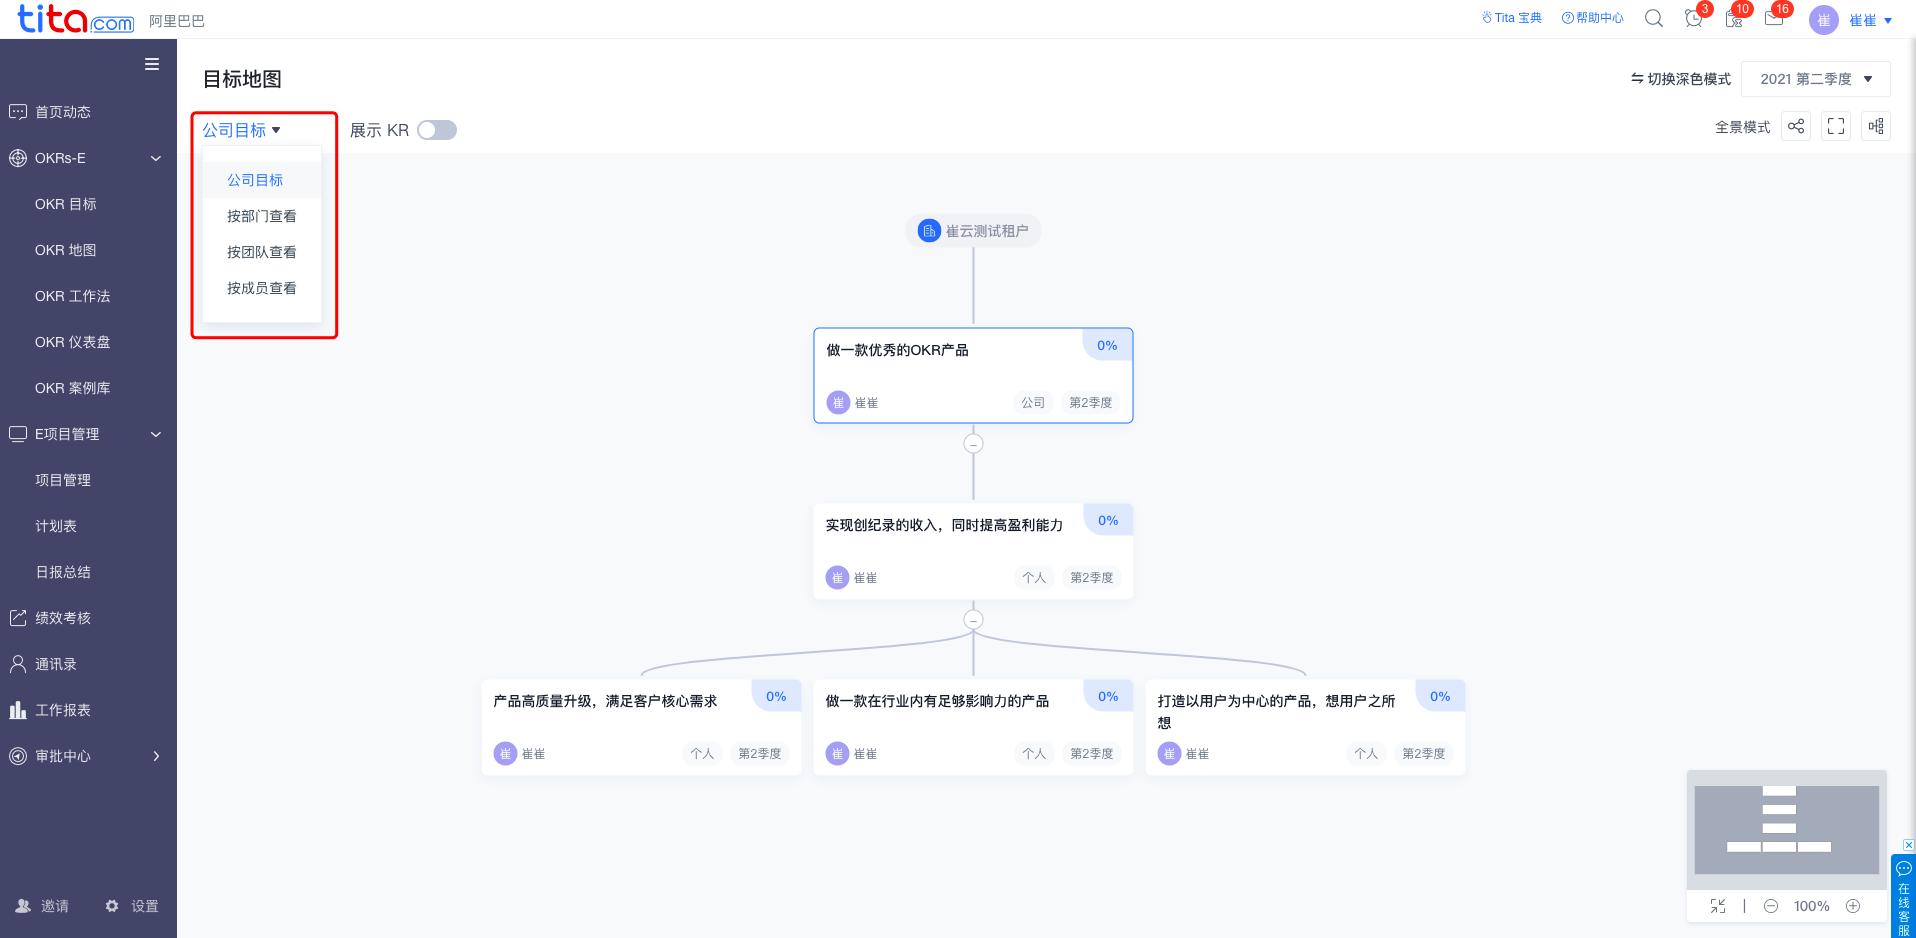 tita.com 升级 | OKR 目标地图全新升级